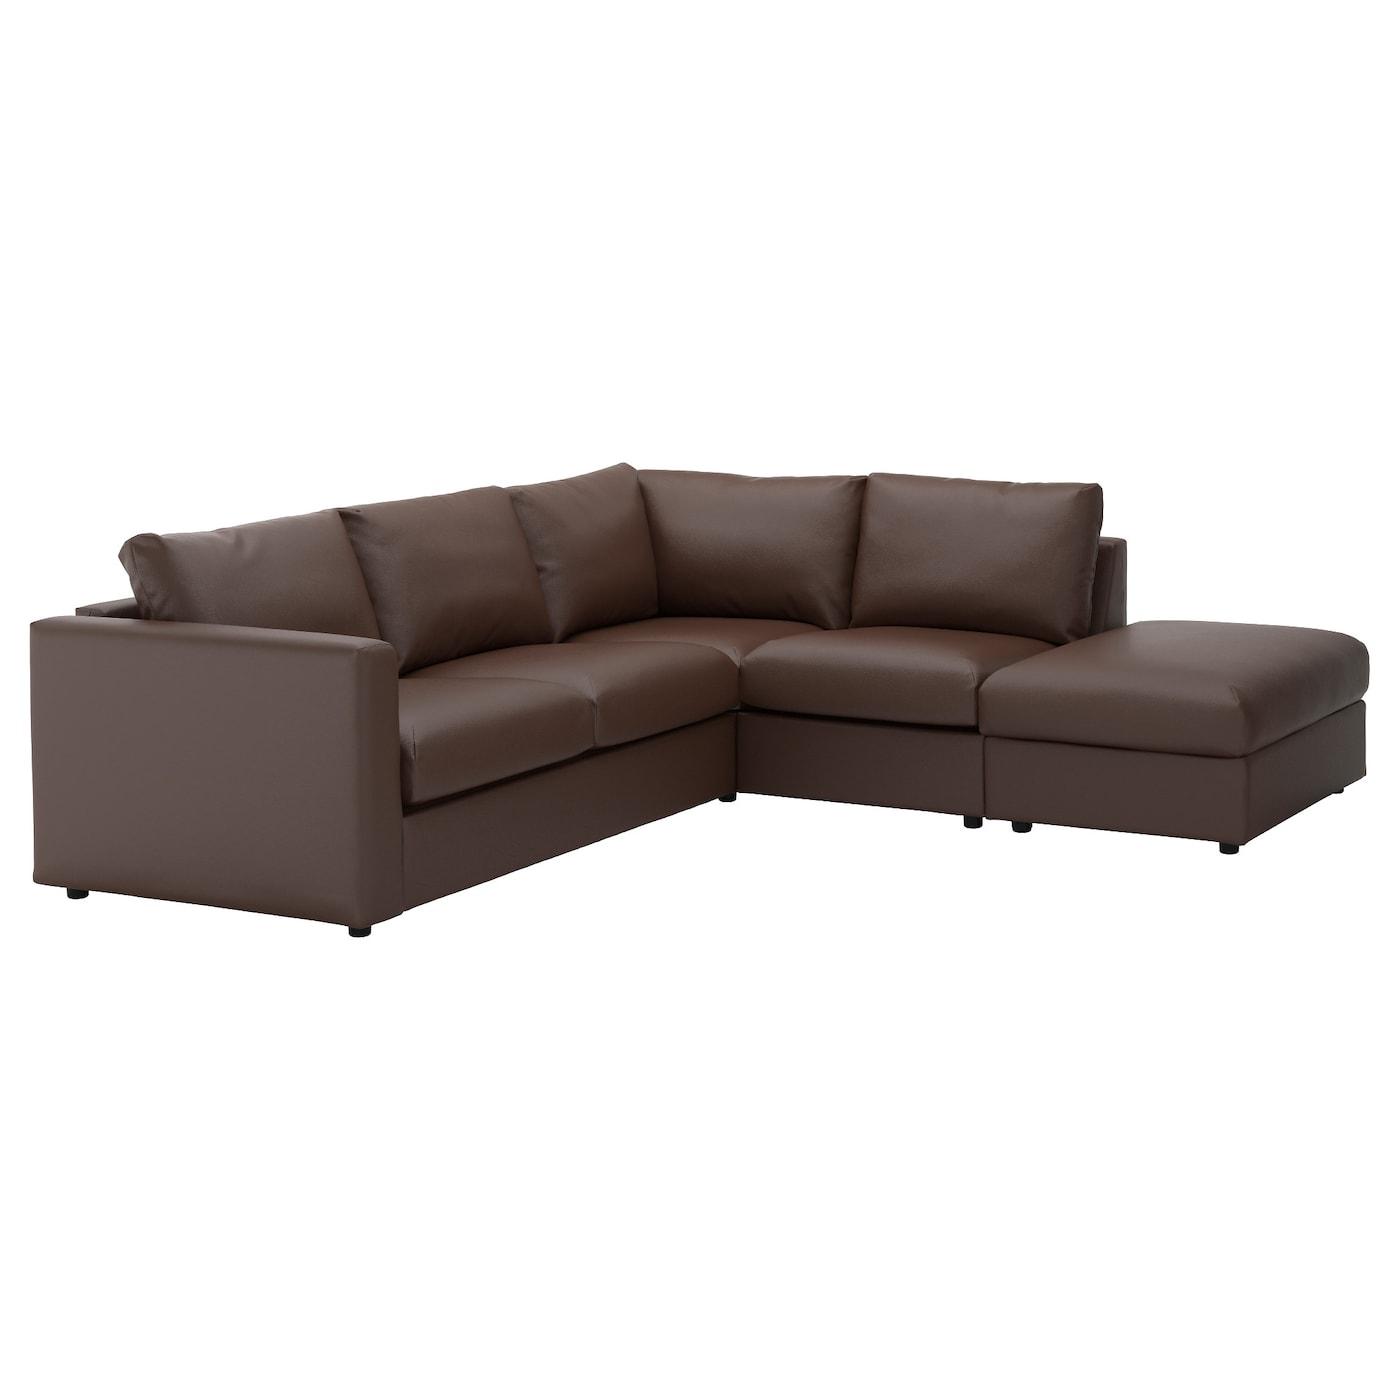 Vimle Corner Sofa 4 Seat With Open End Farsta Dark Brown